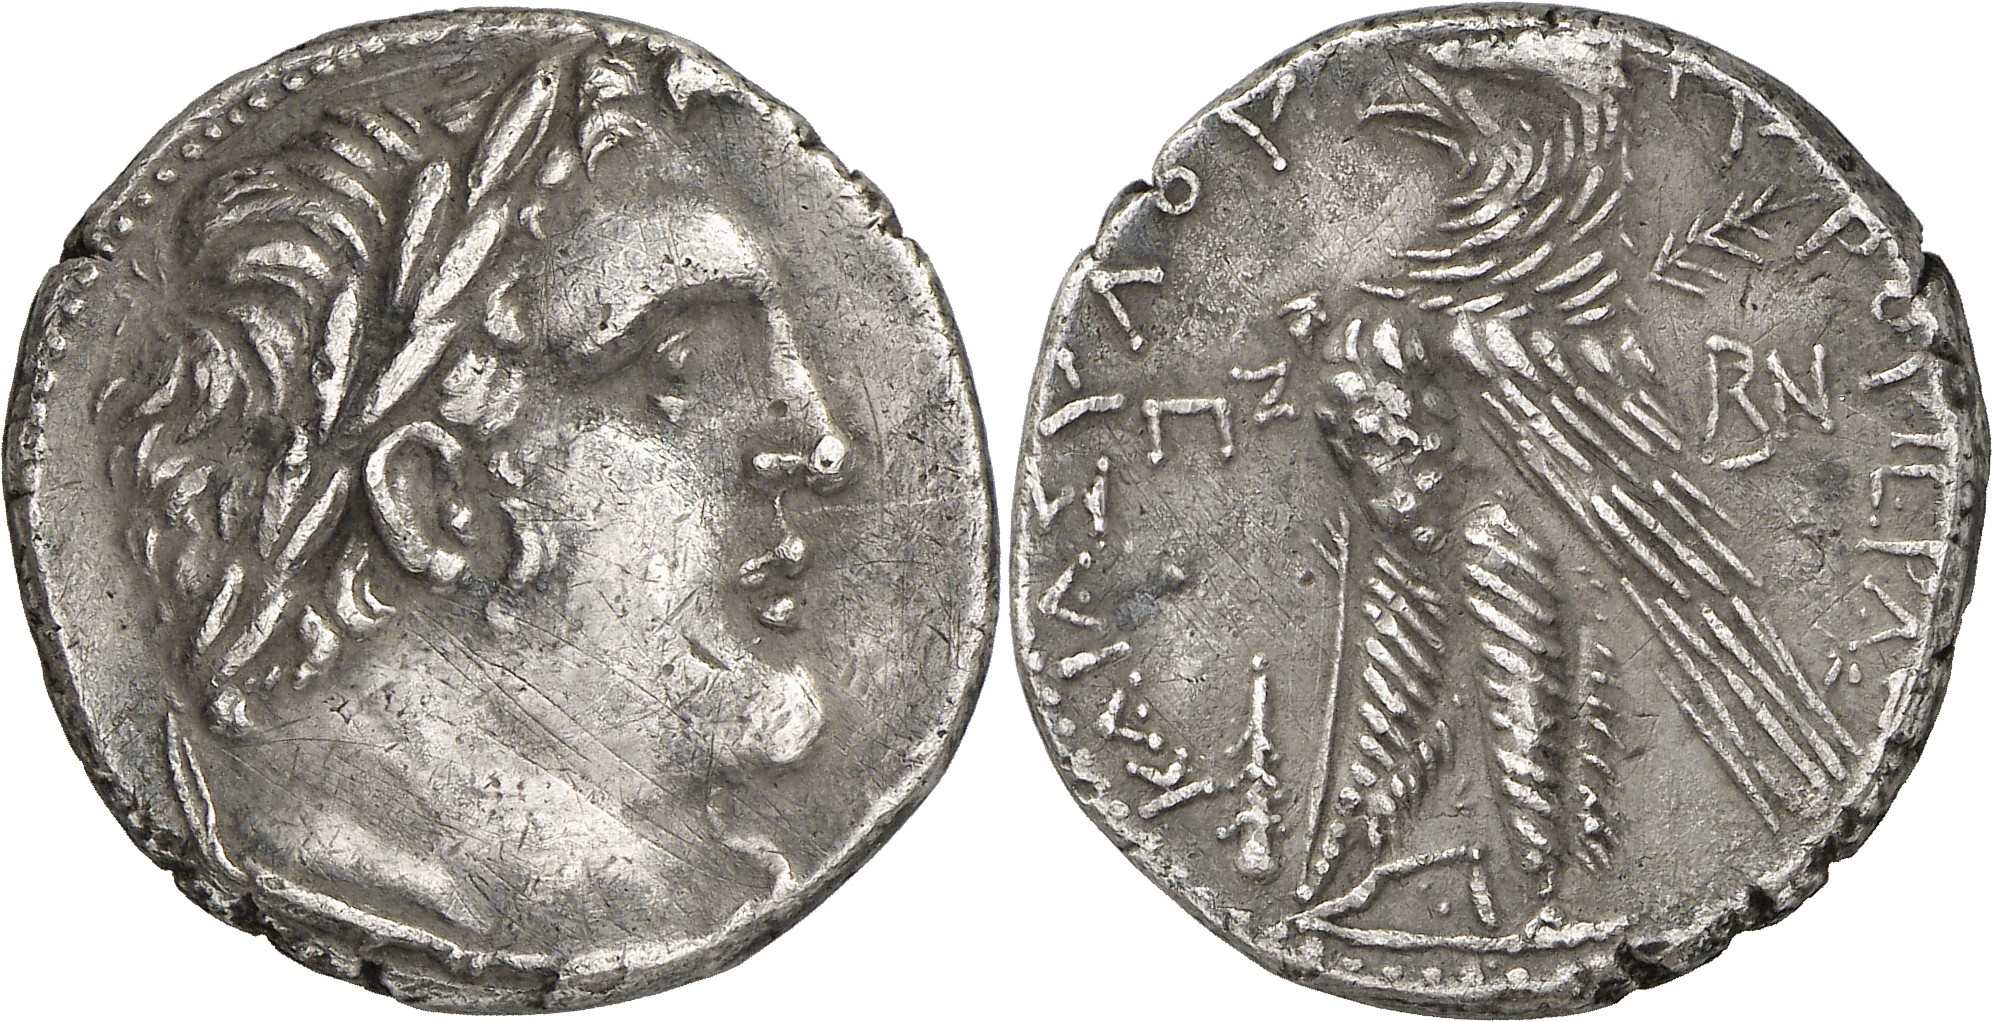 P.J. Murphy poetry, Potters Field, Judas, 30 pieces of silver, Tyre shekels, Melqarth